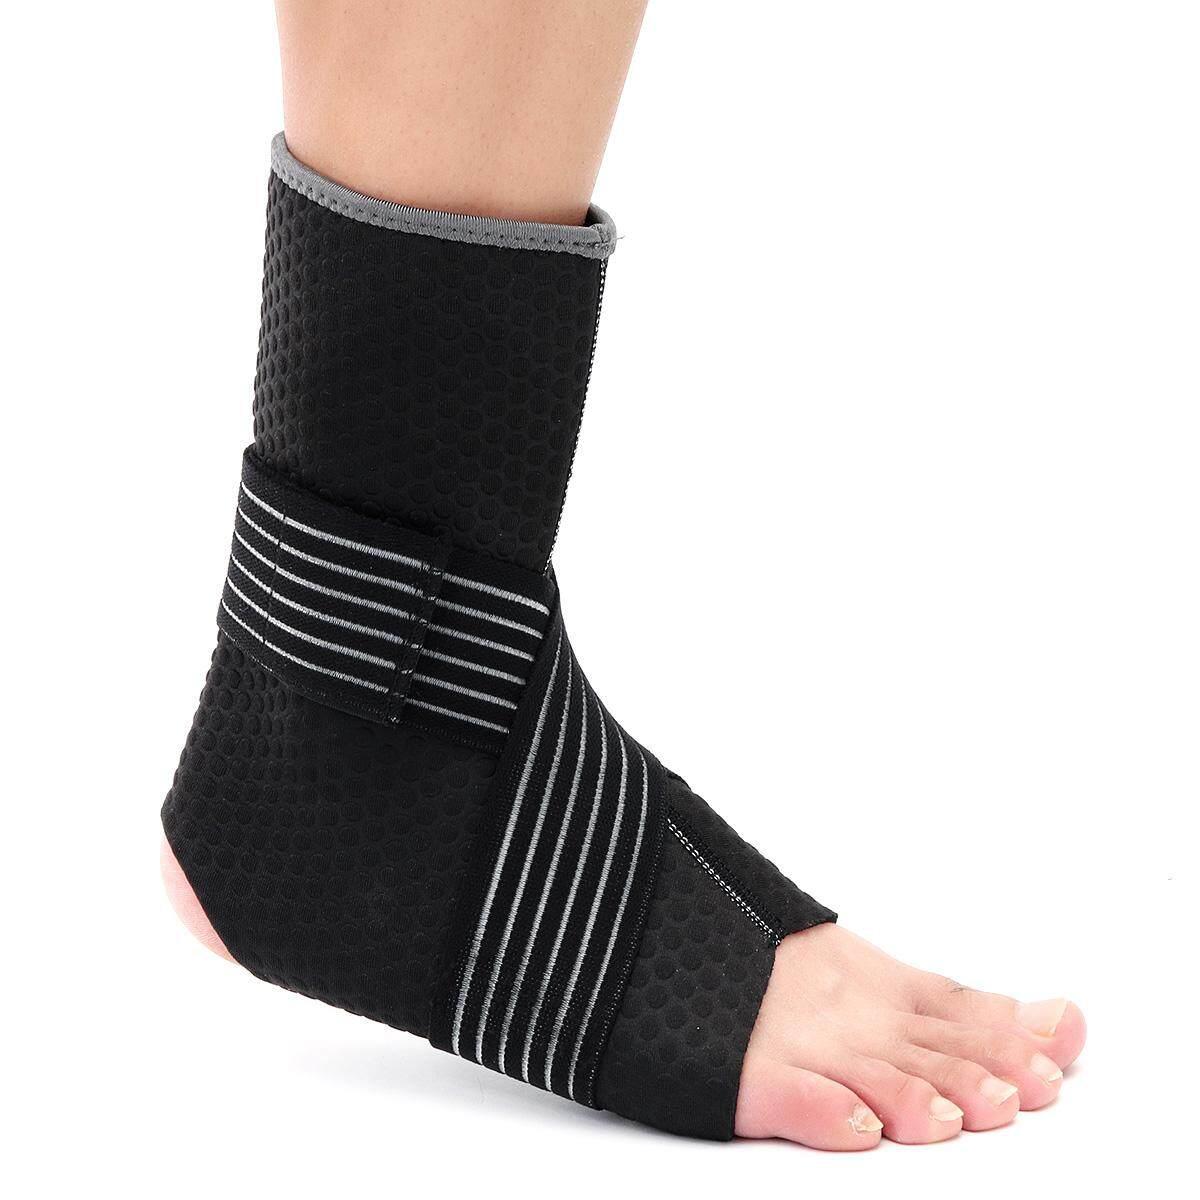 Detail Gambar Neoprene Ankle Support Compression Strap Achilles Tendon Brace Sprain PT[L] - intl Terbaru